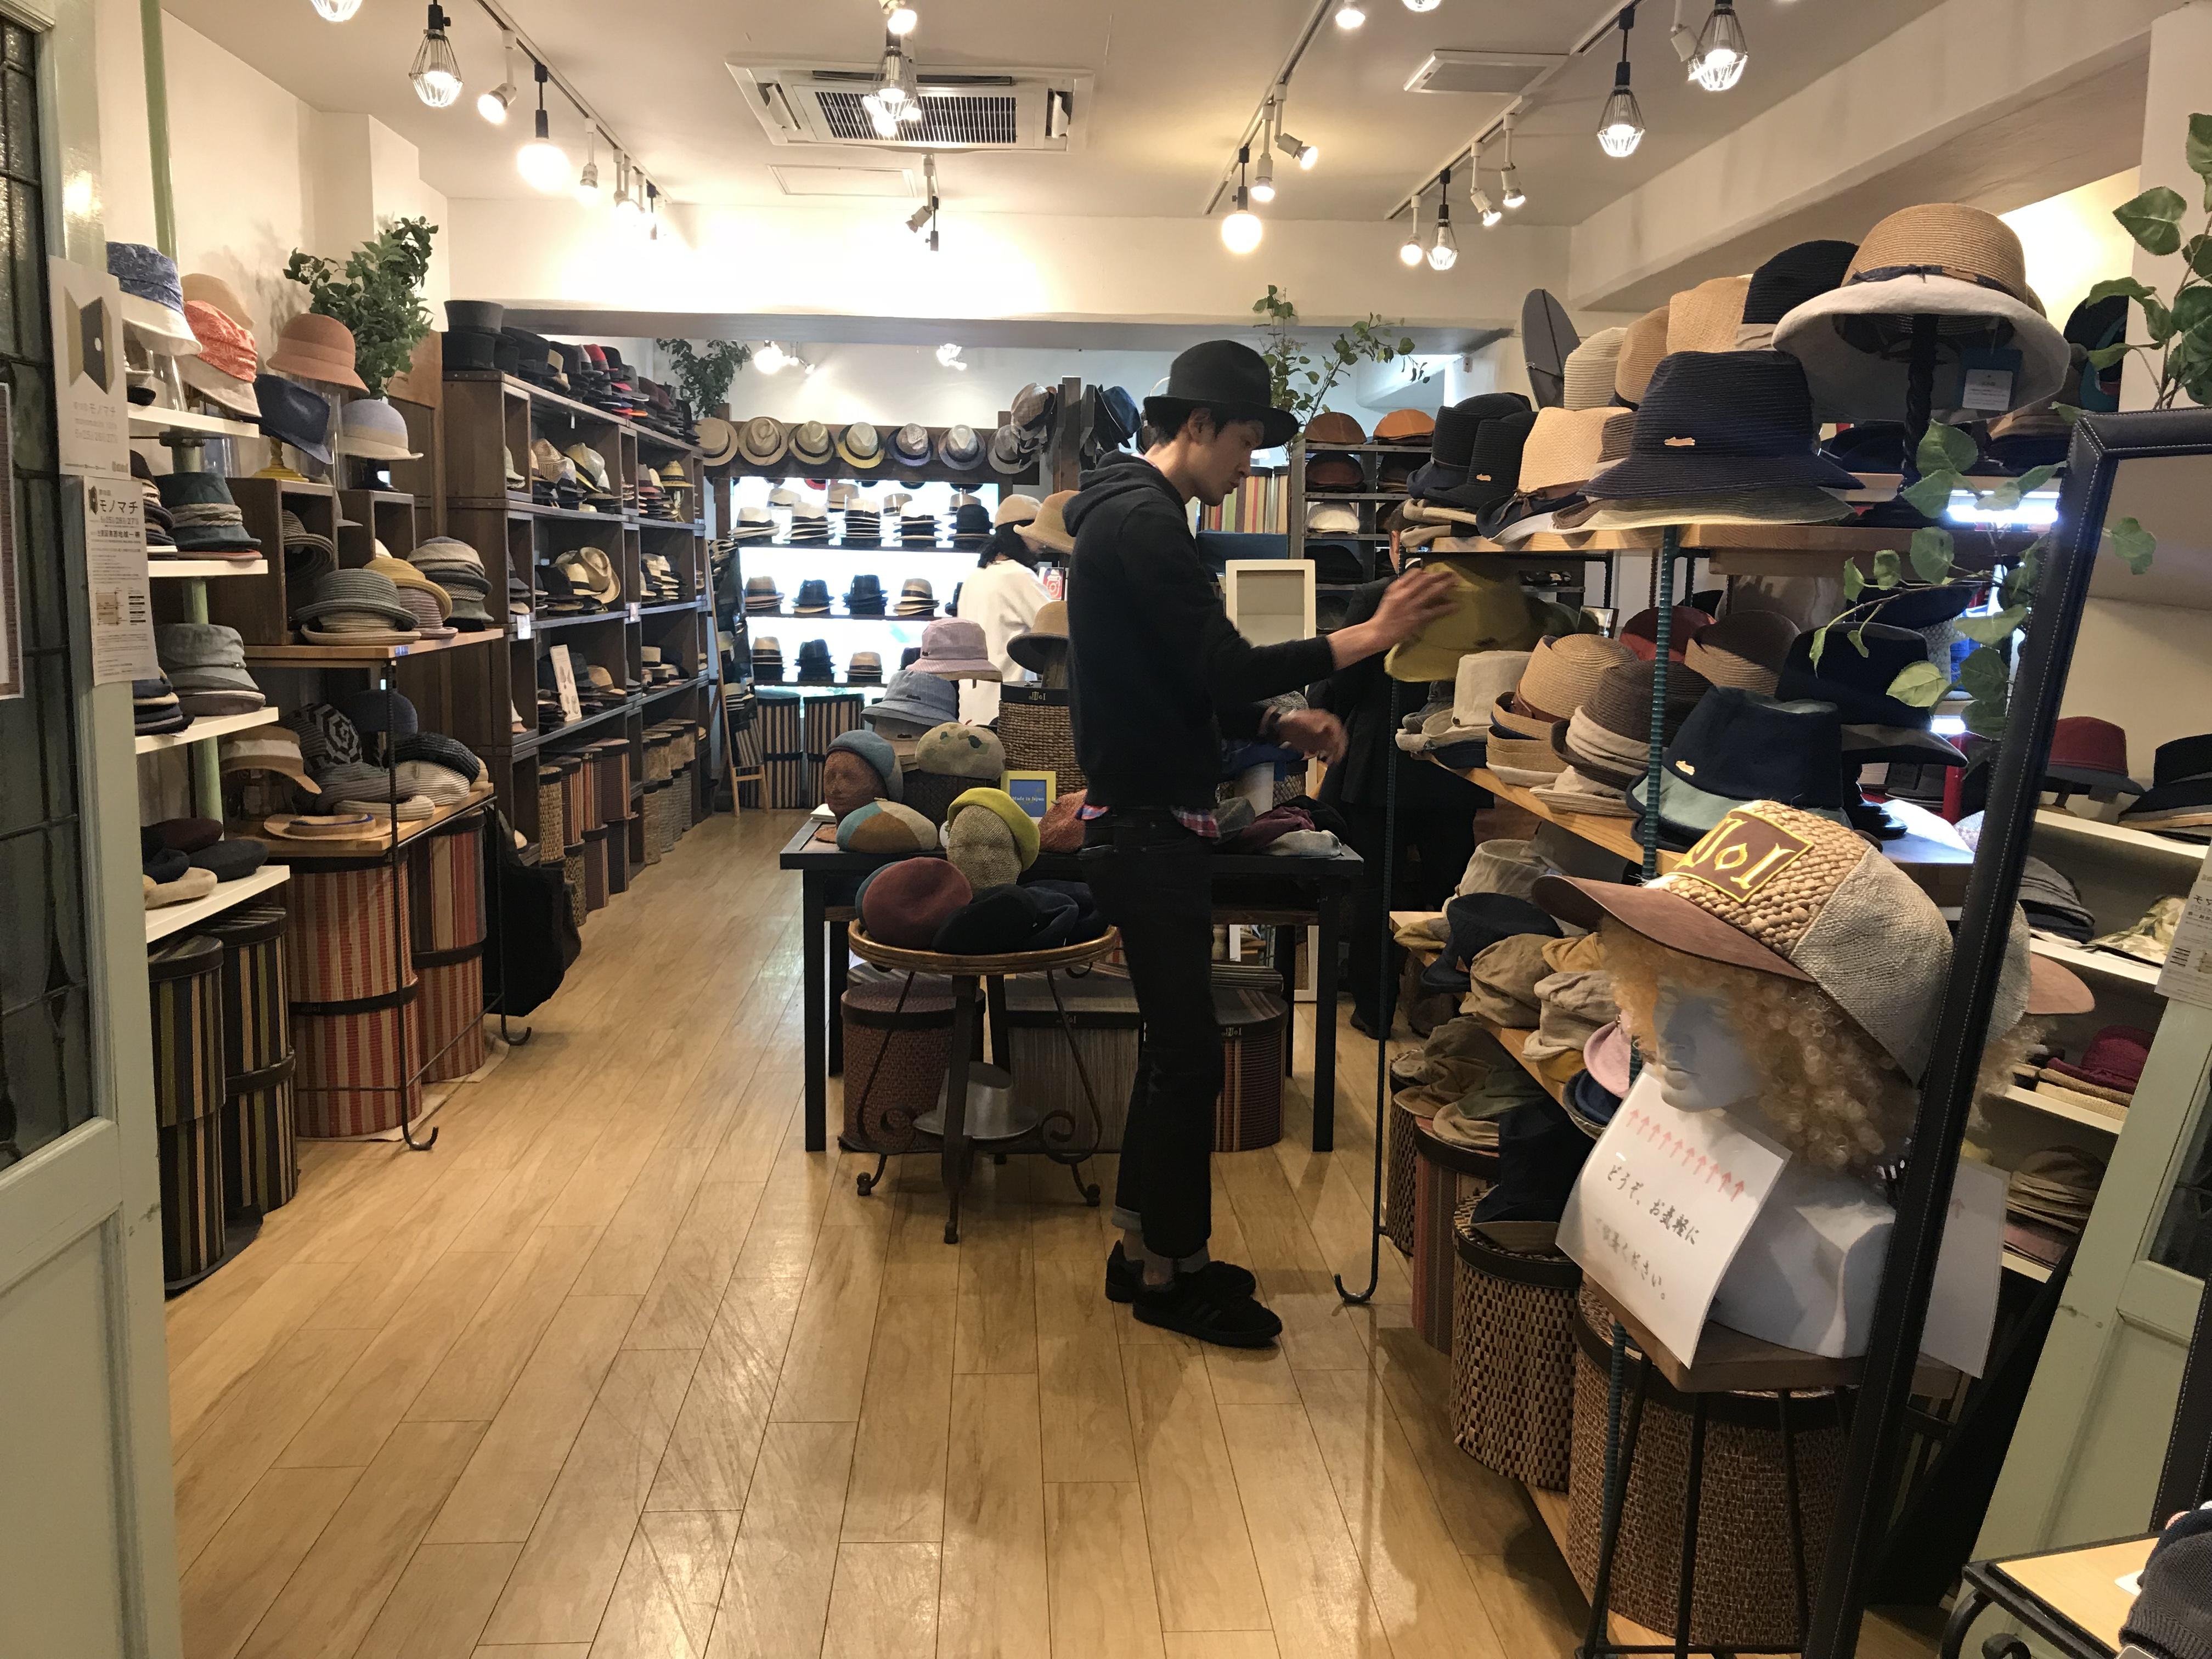 Tiny Rabbit Hole – craft fair cats aki-oka bags pouch handmade sewing felting hat crochet knitting sock cafe leather amigurumi